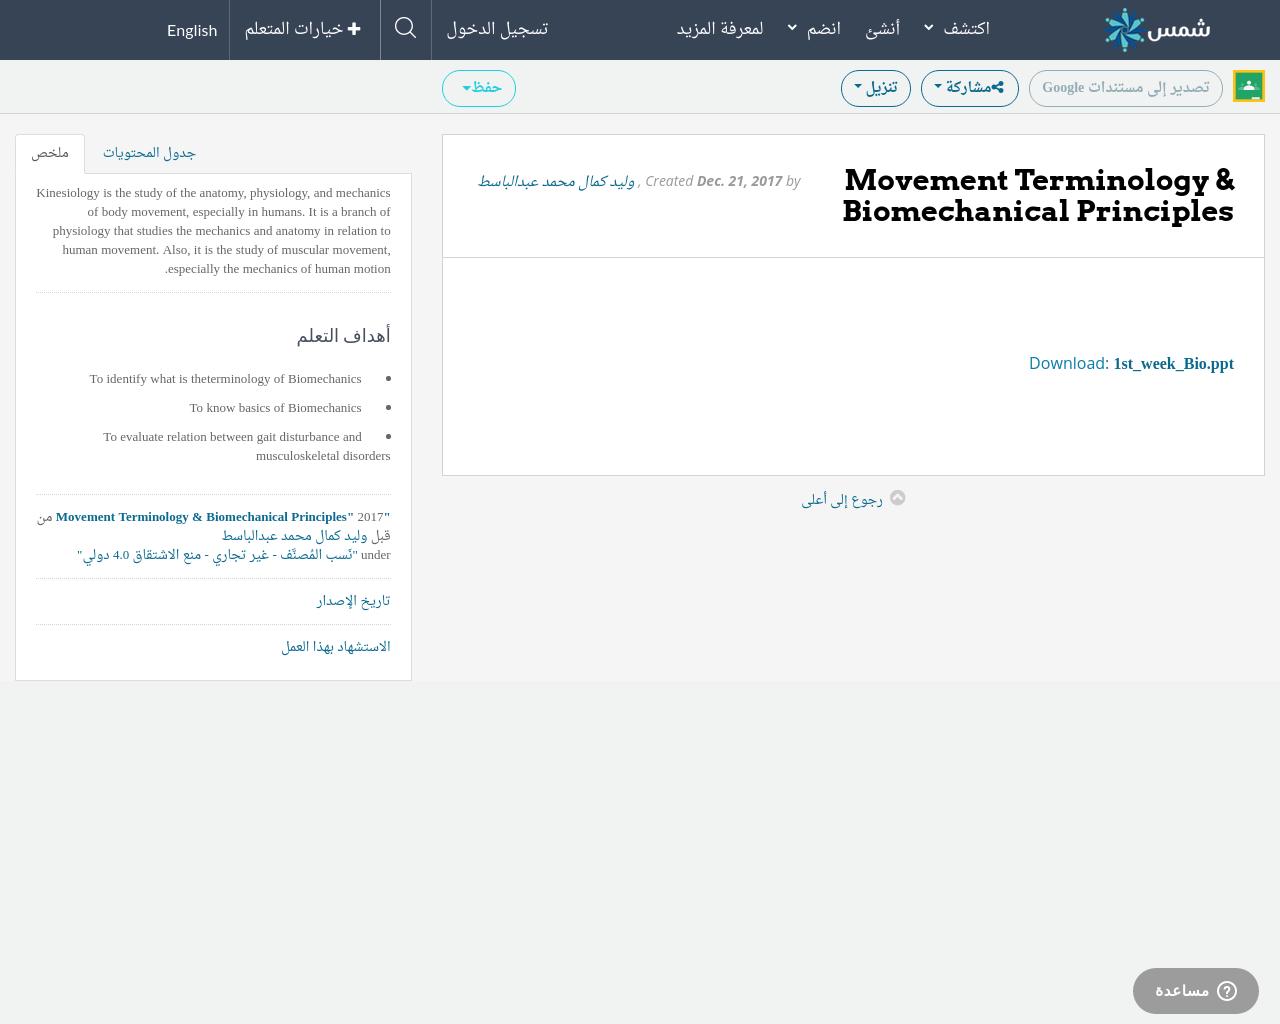 Movement Terminology & Biomechanical Principles   SHMS - Saudi OER